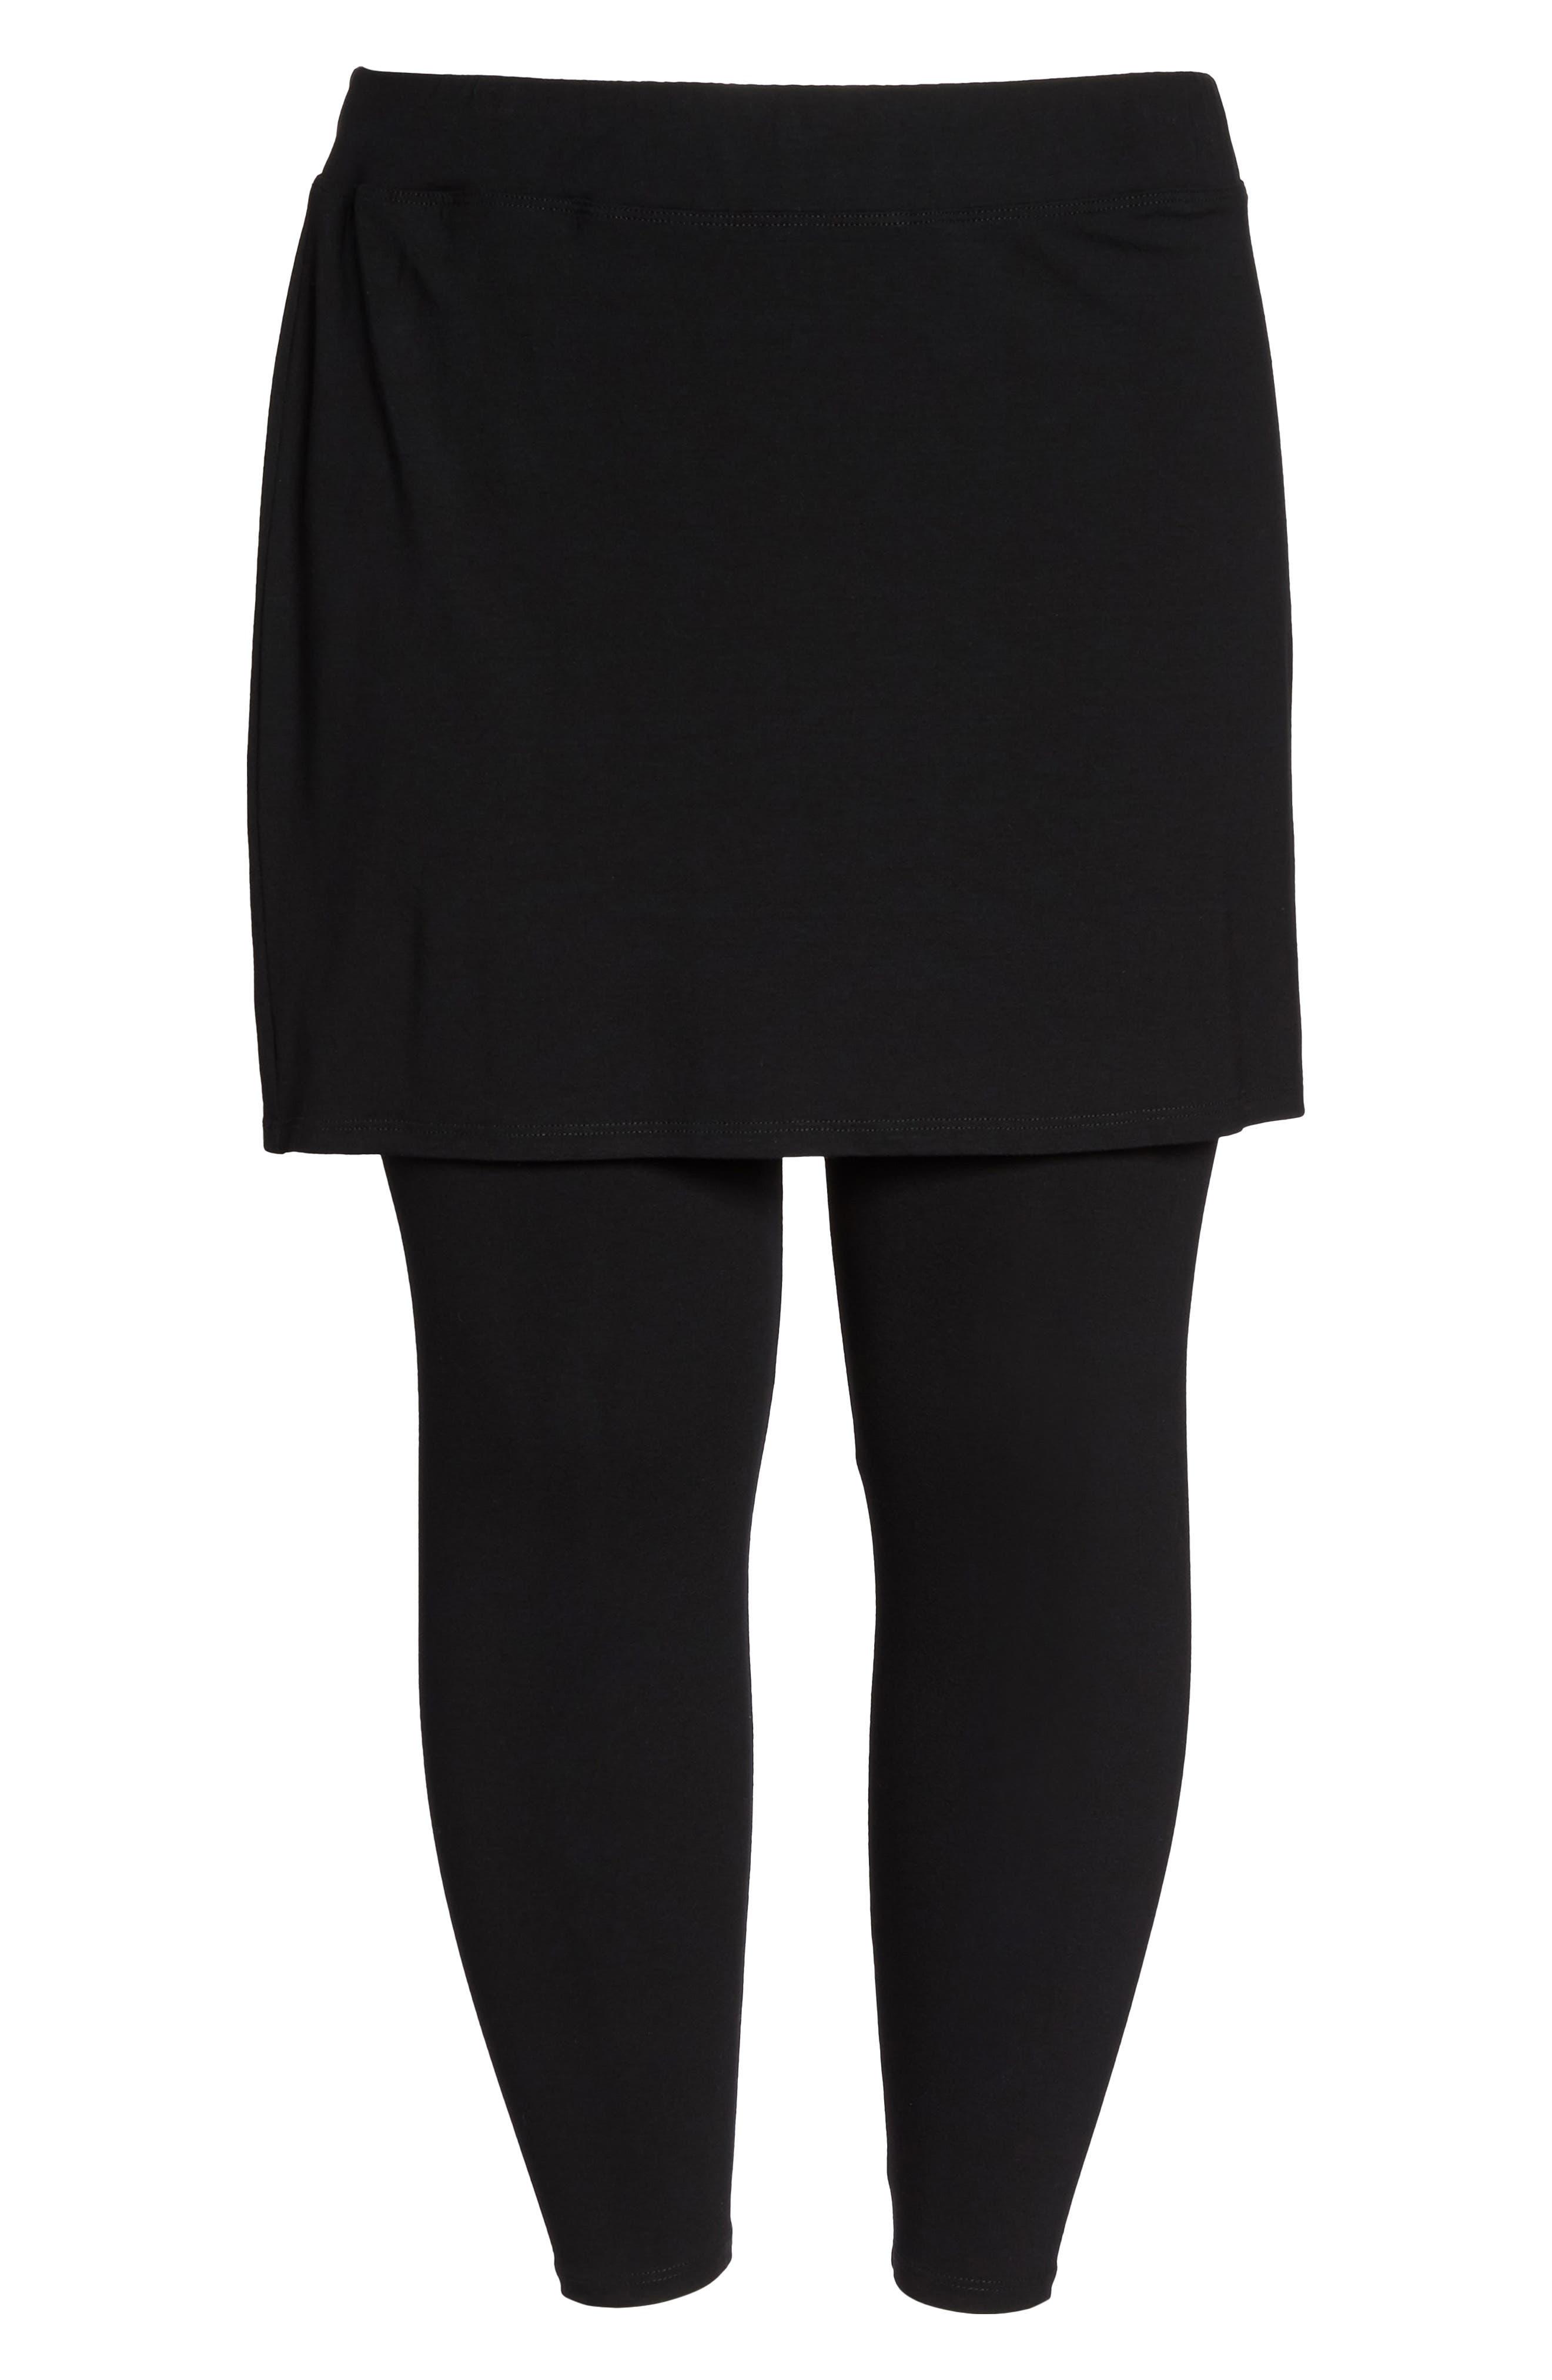 1570c505d9b6b ... UPC 713259583087 product image for Plus Size Women's Eileen Fisher  Skirted Leggings, Size 3X -